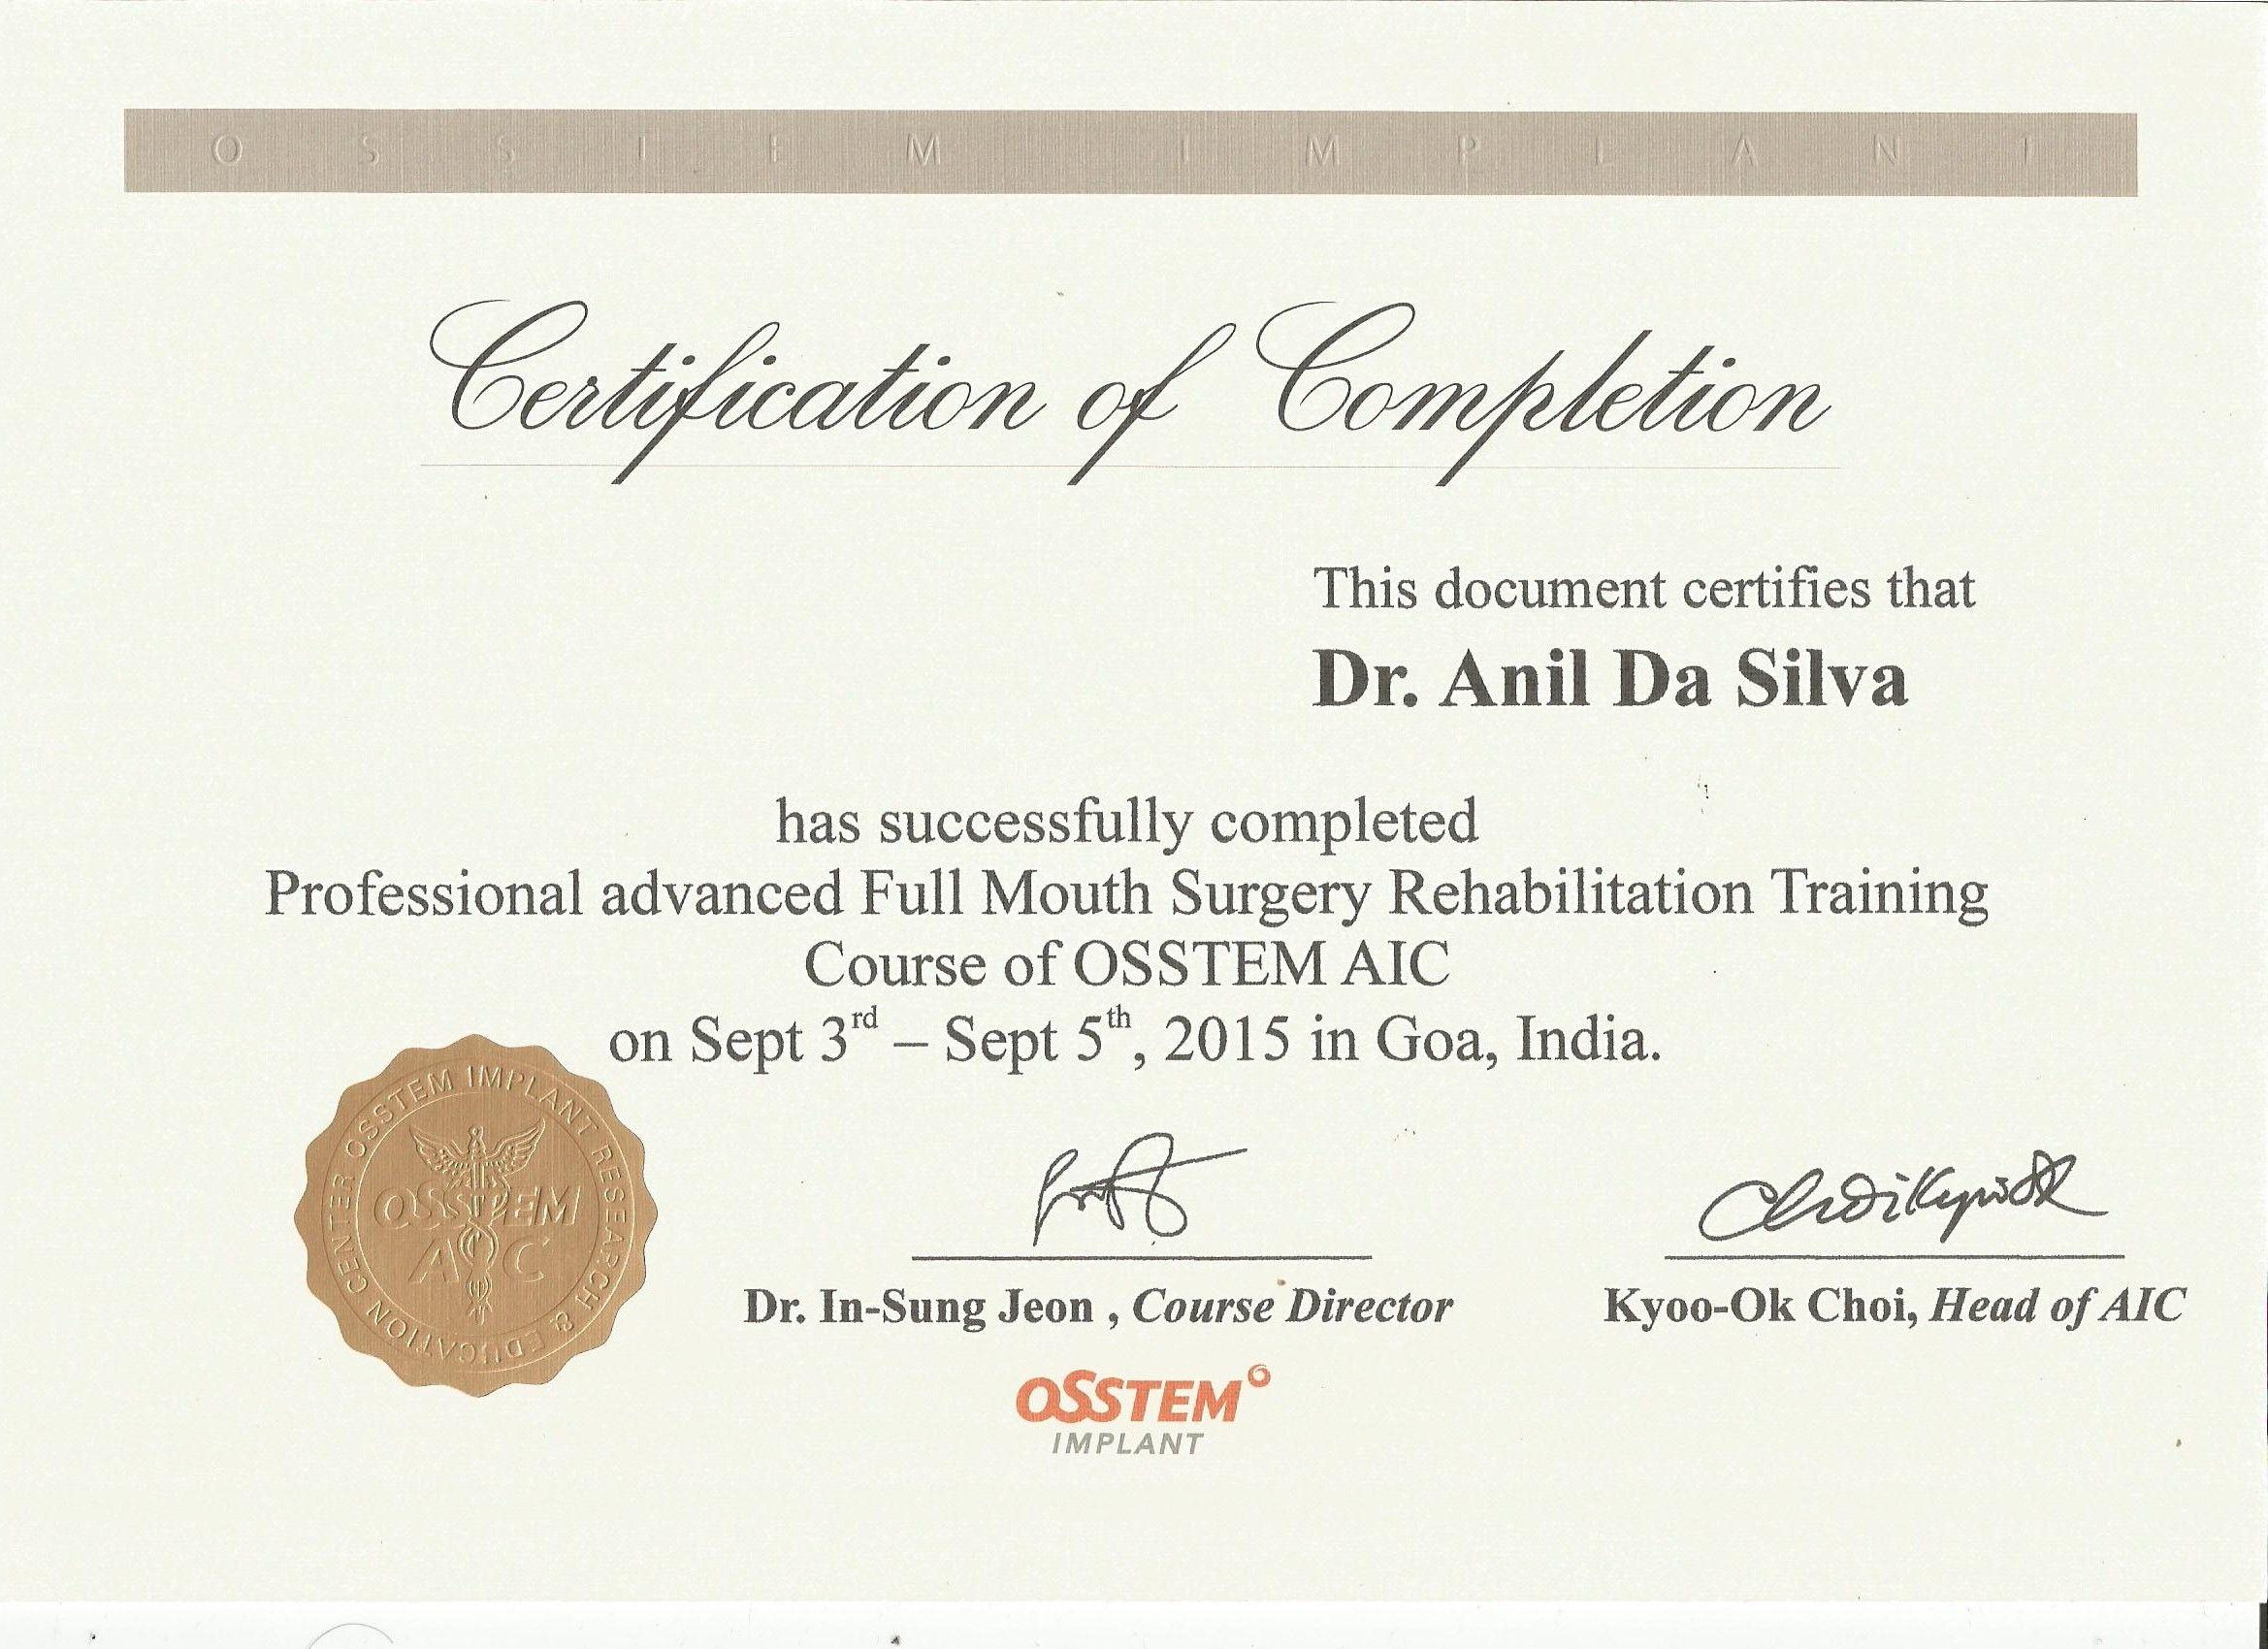 Course Of Osstem Aic 2015 Certificates Pinterest Certificate